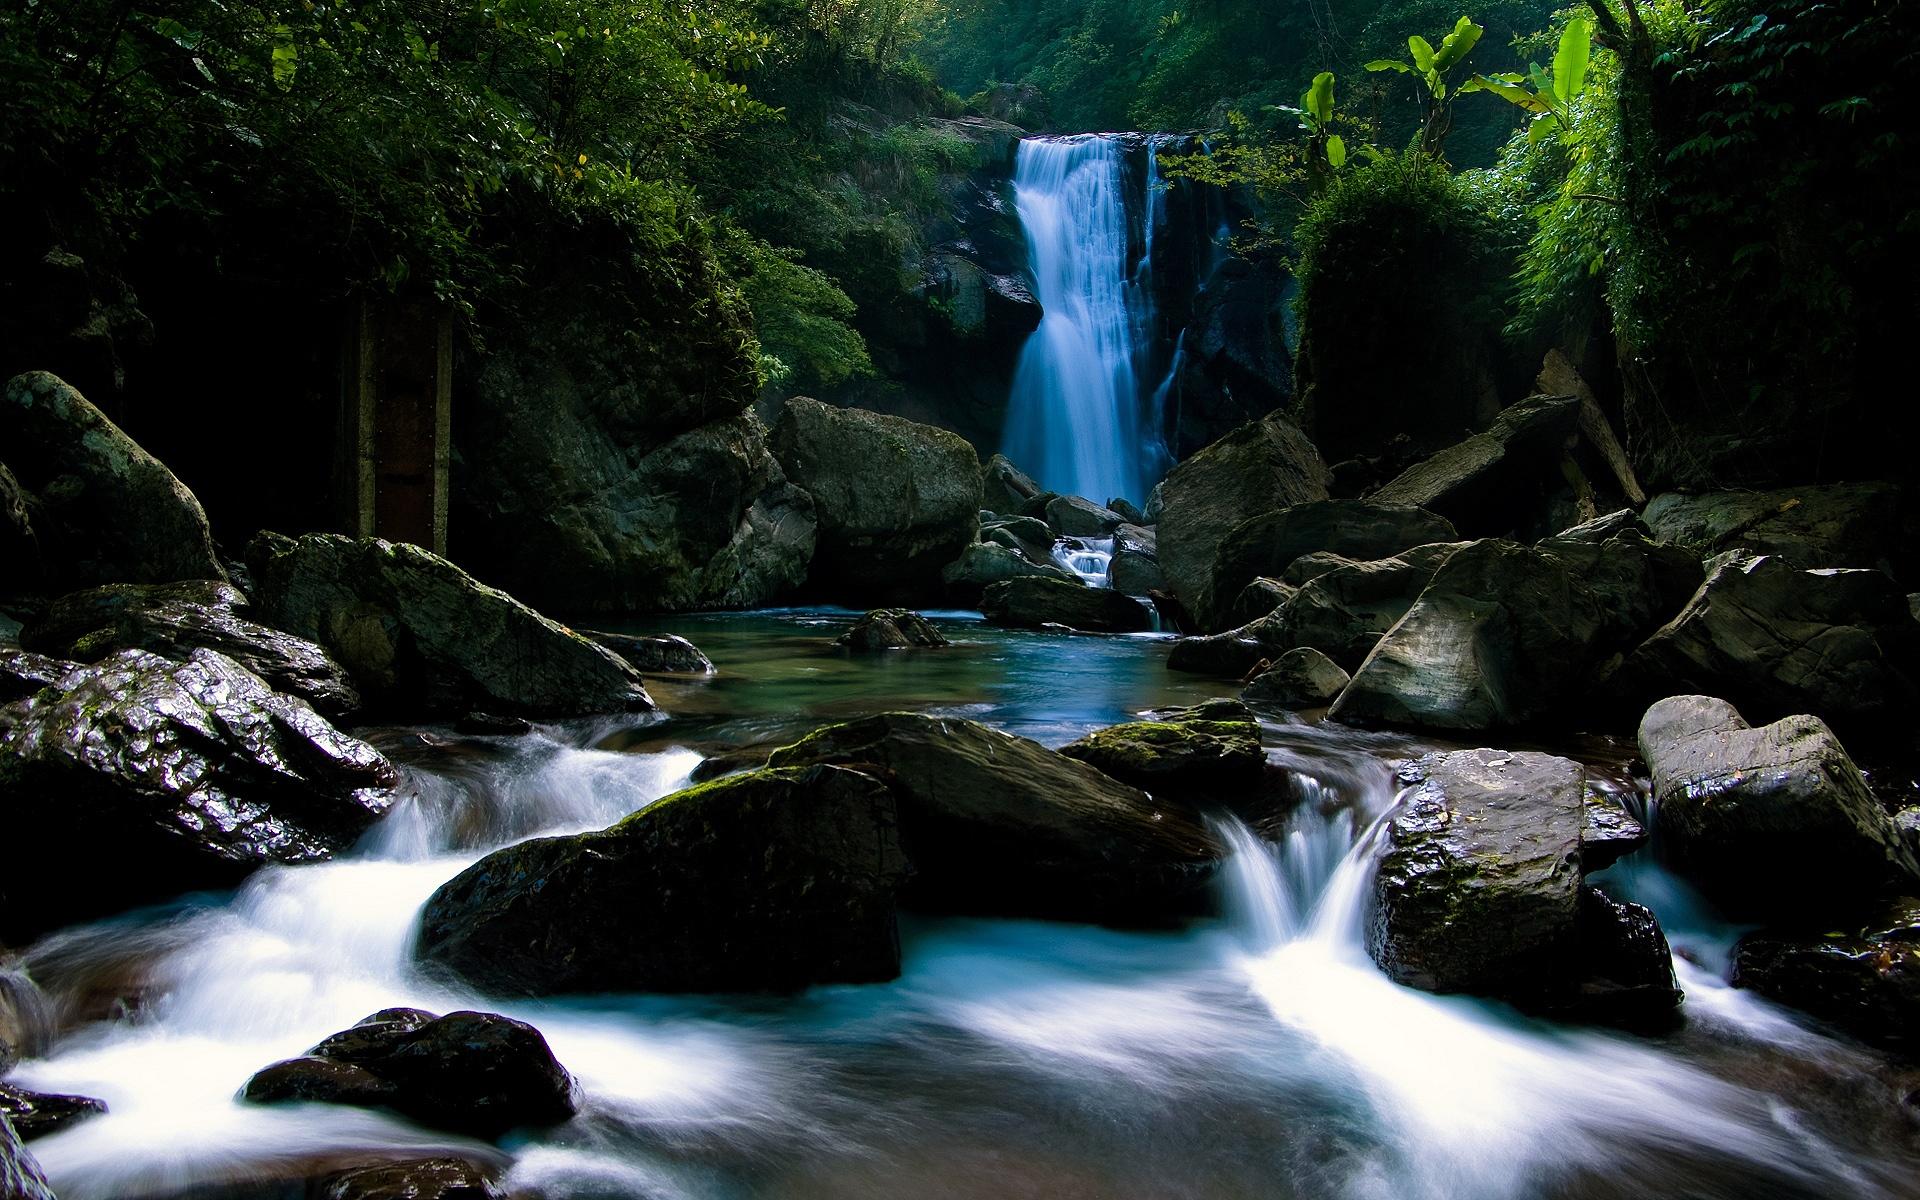 20 Gorgeous HD Waterfall Wallpapers - HDWallSource.com